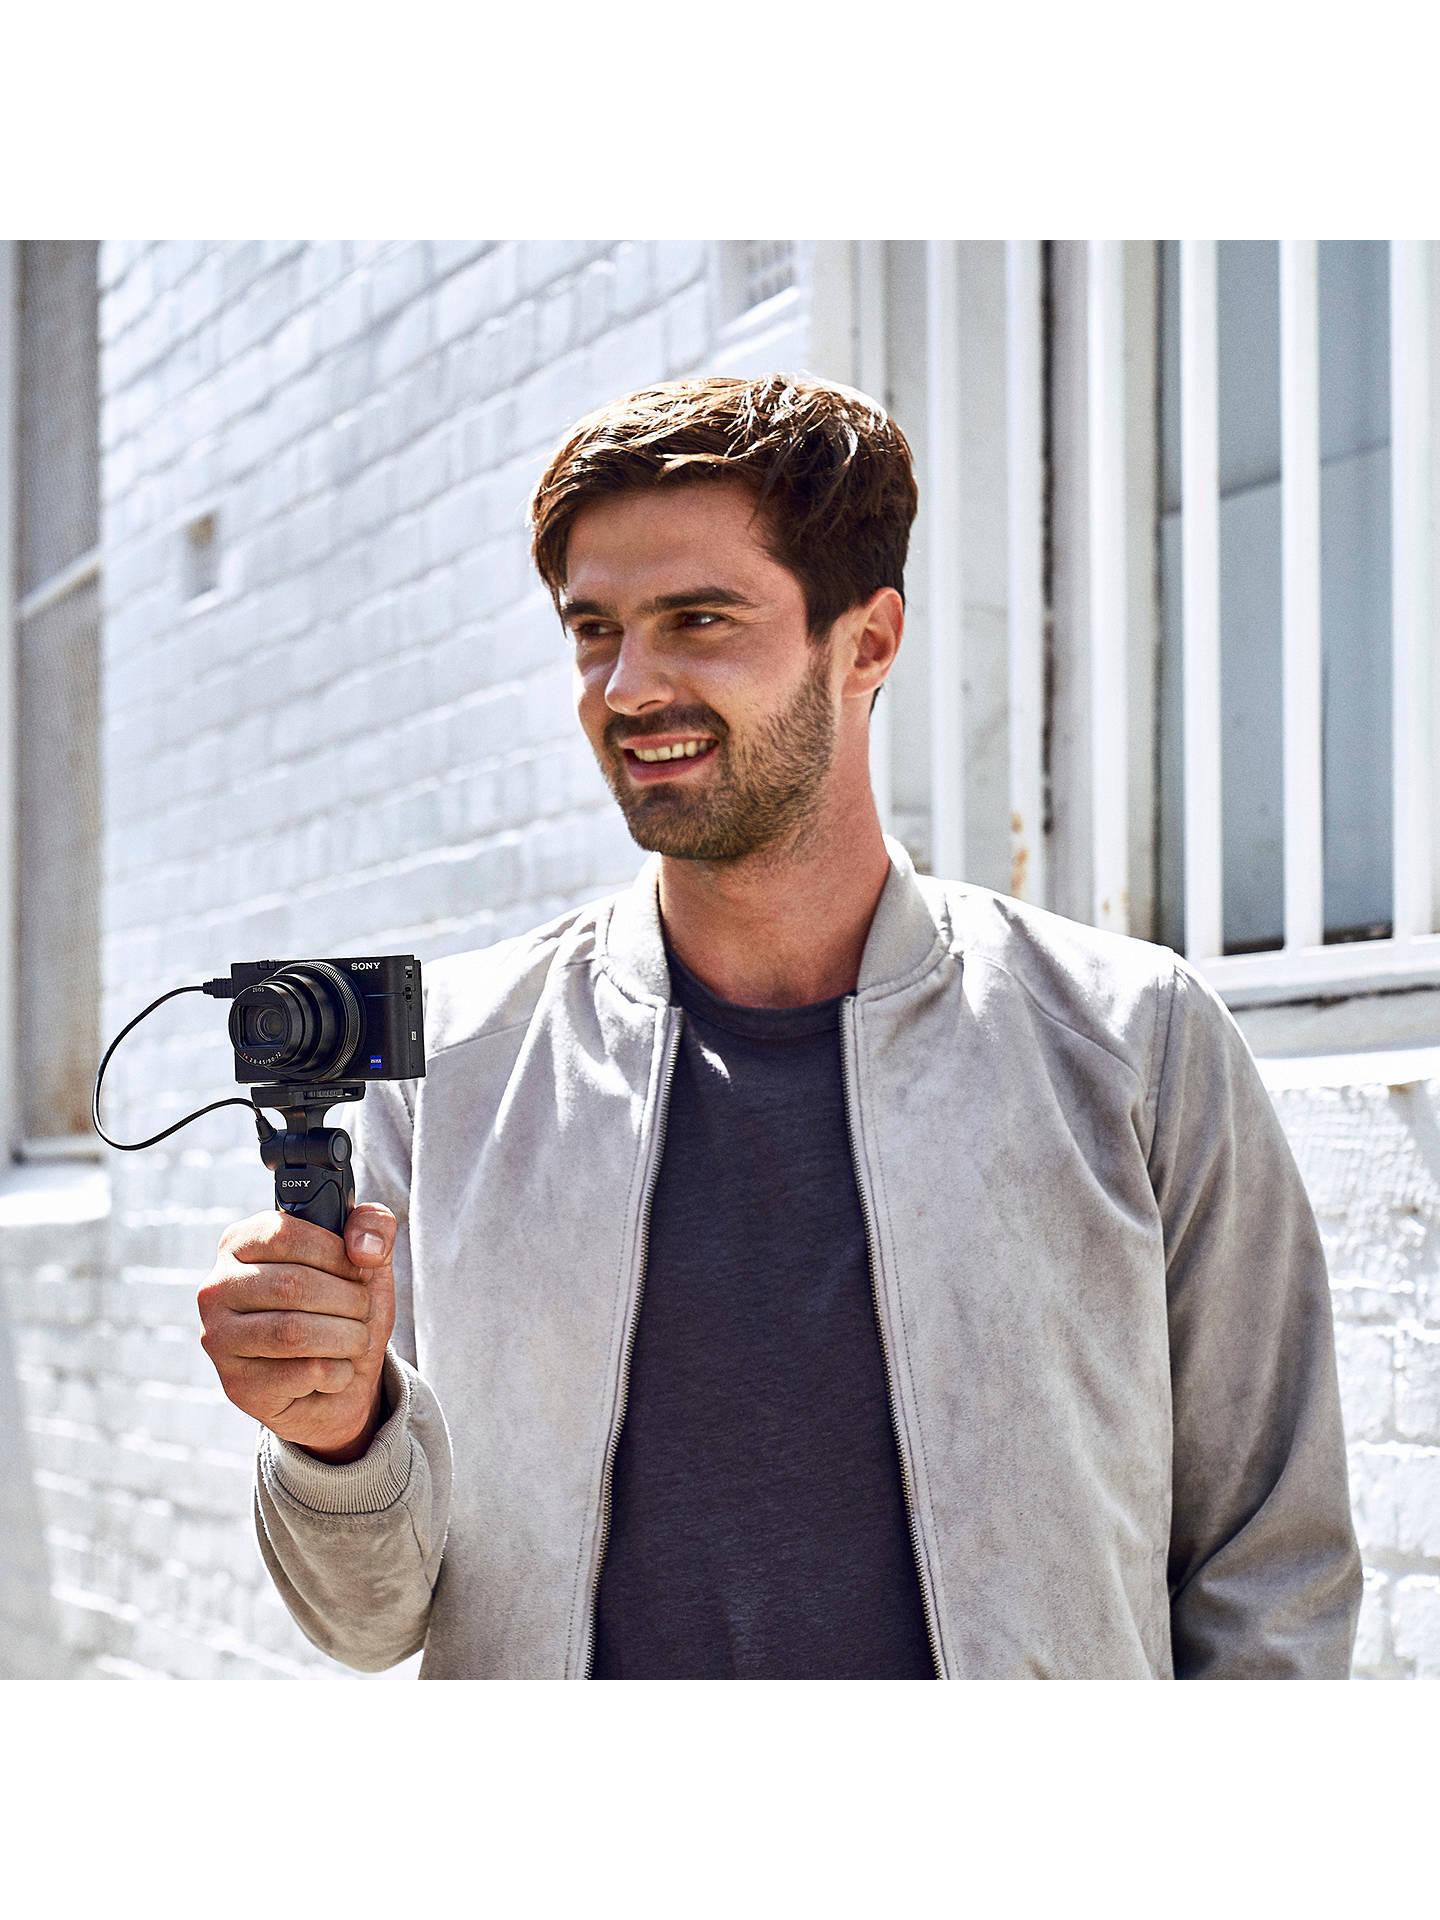 Sony Cyber-shot DSC-RX100 VI Camera, 4K, 20 1MP, 8x Optical Zoom, Wi